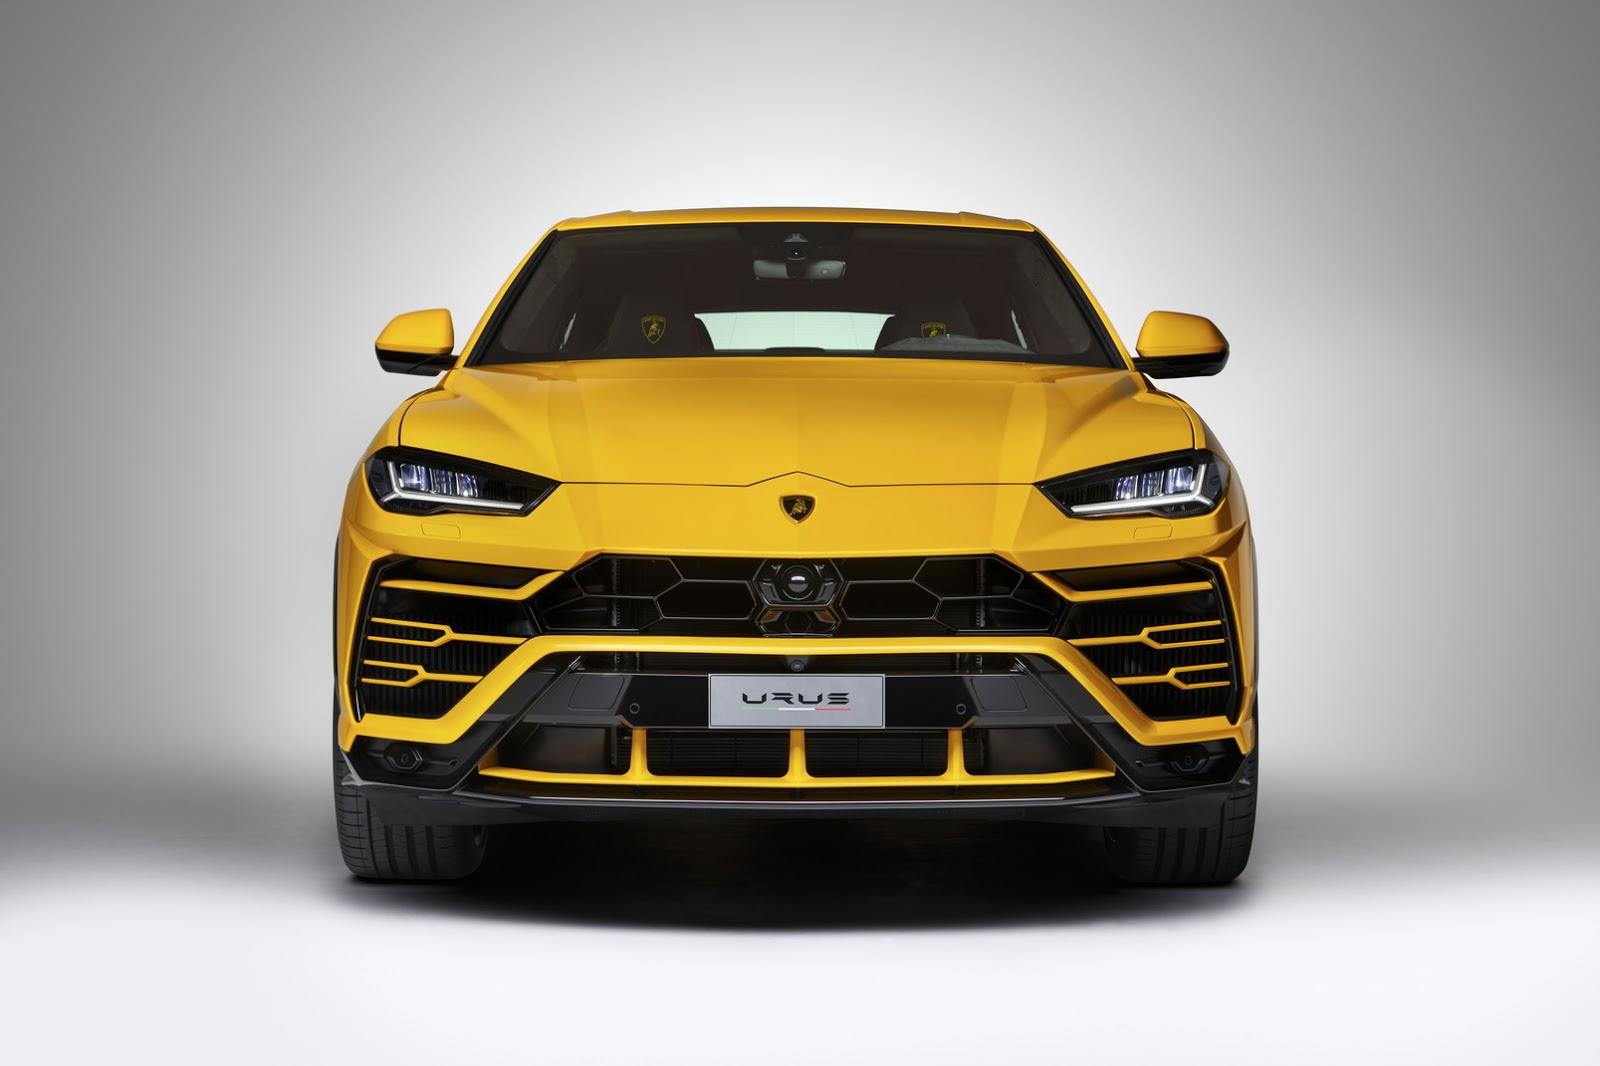 Lamborghini_Urus_tinhte_12.jpg